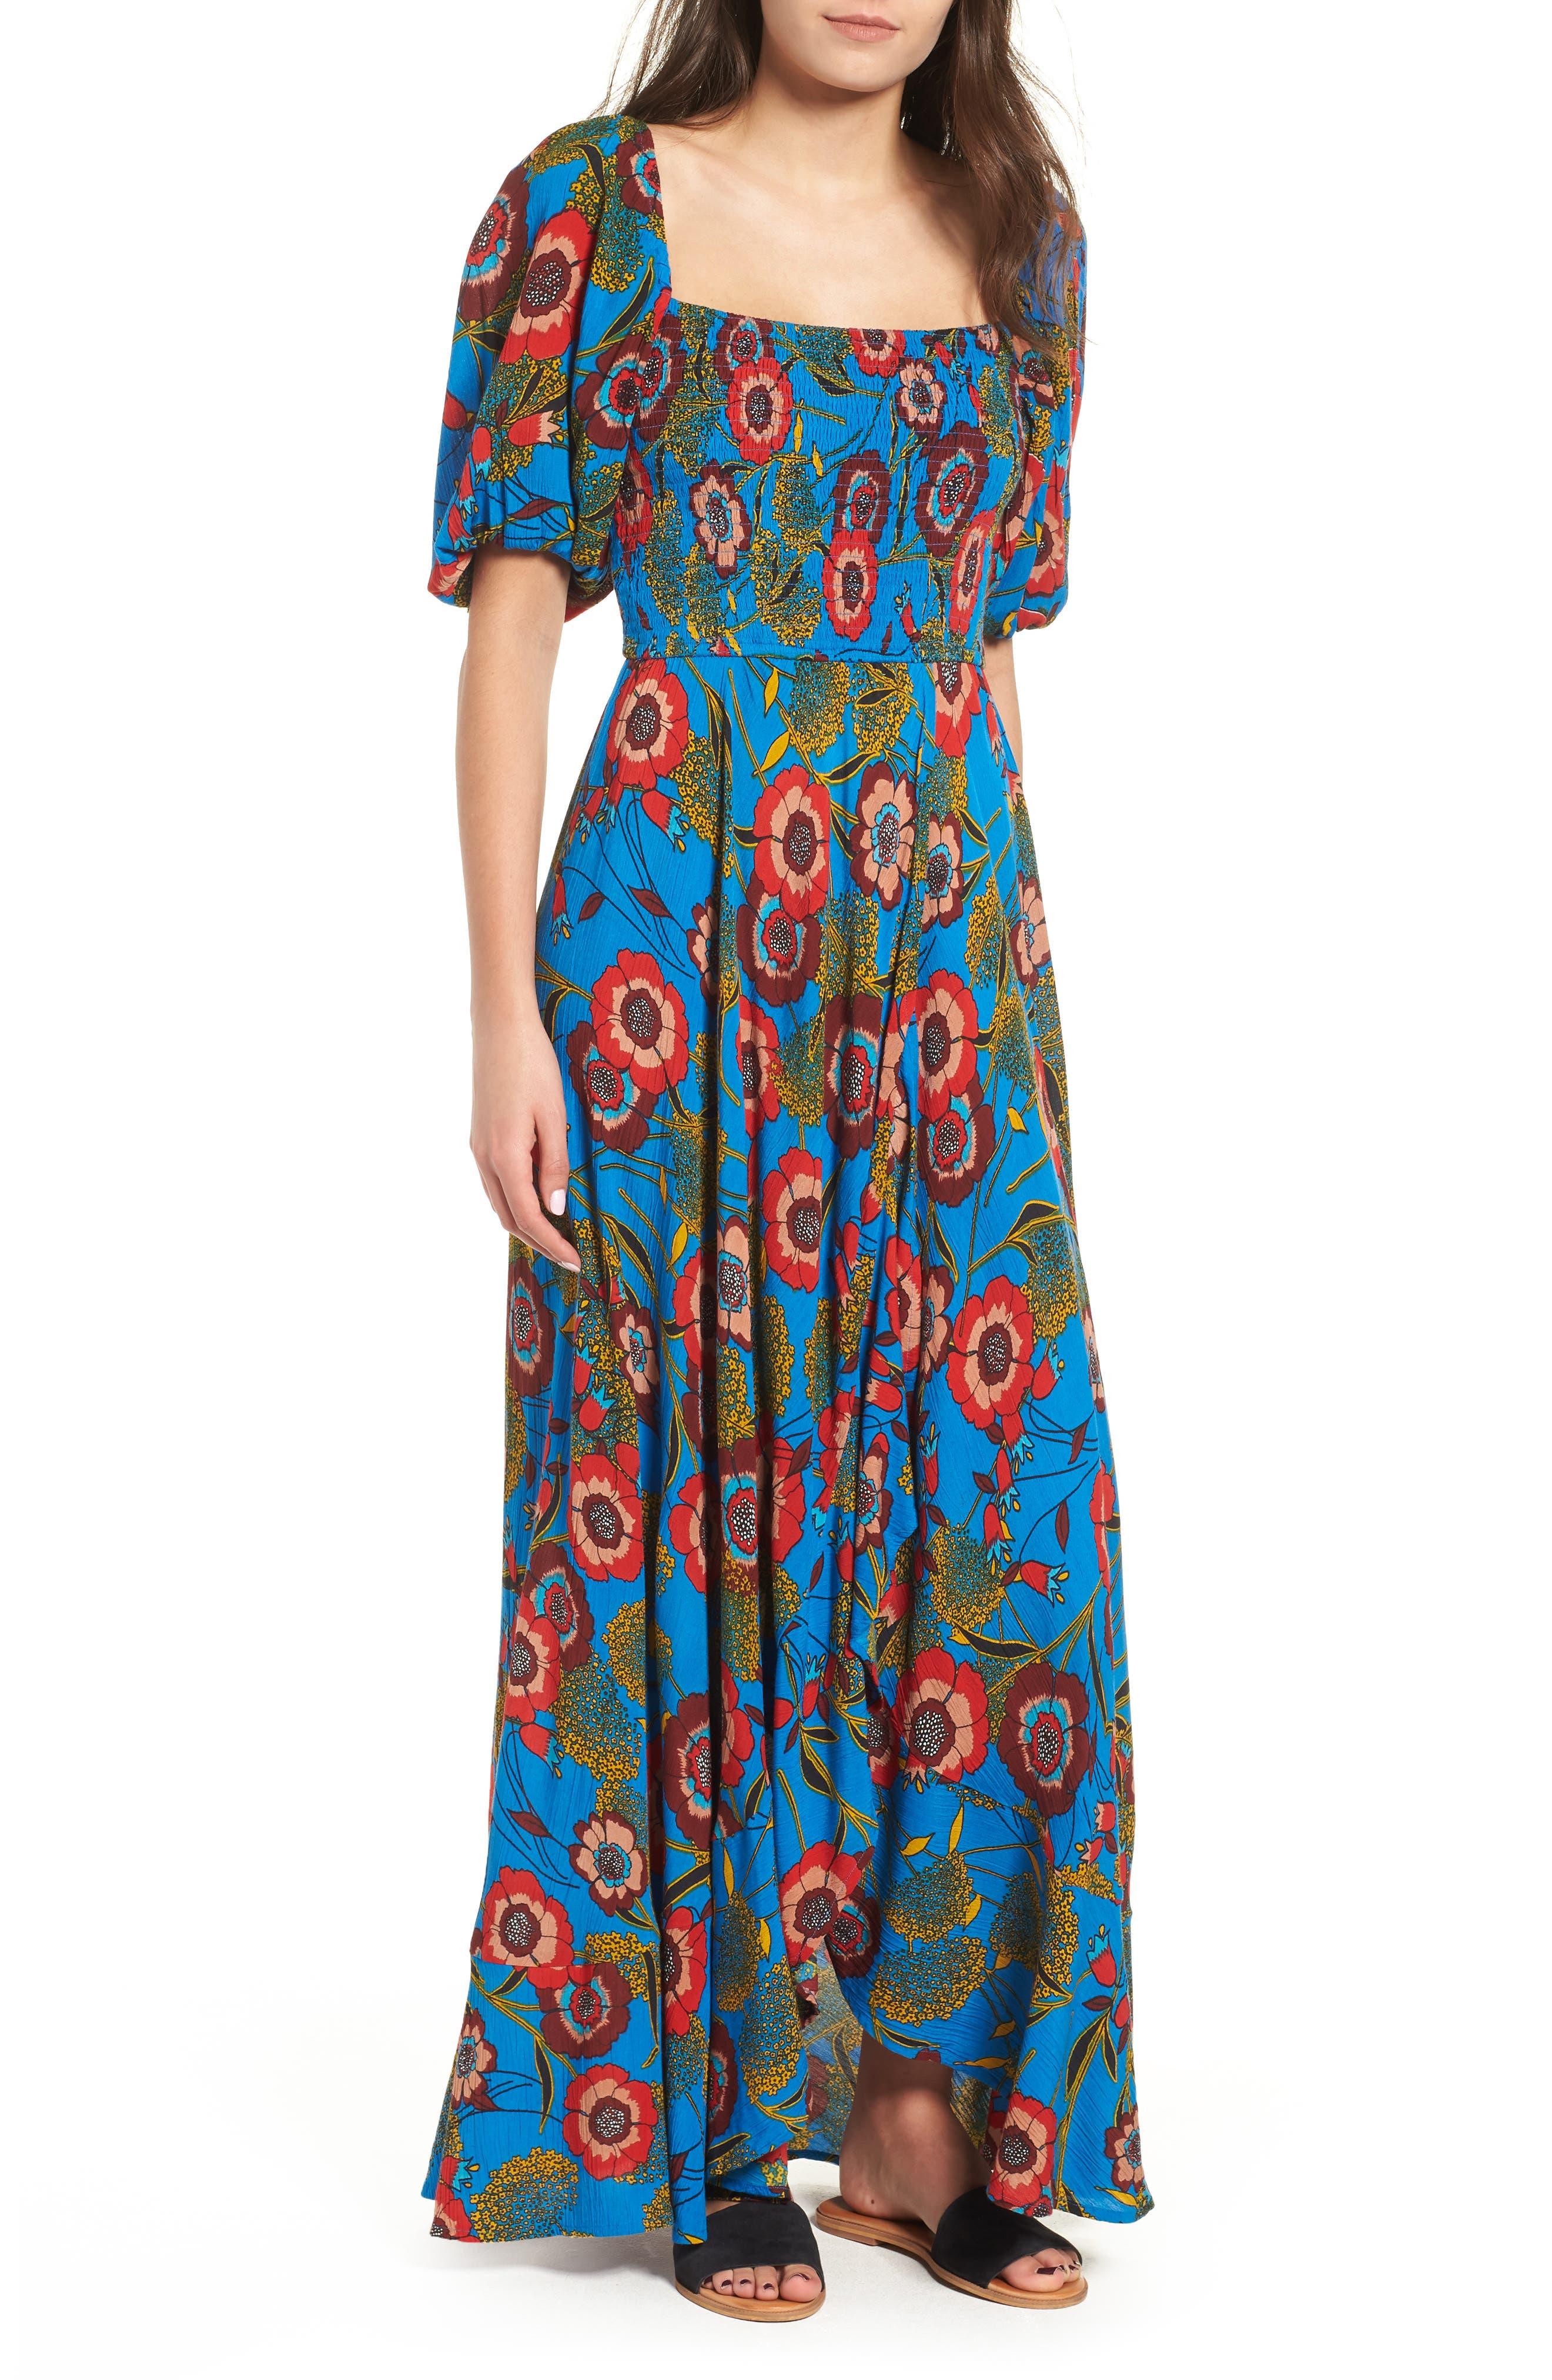 Heirloom Blossom Maxi Dress,                             Main thumbnail 1, color,                             Royal/ Blue/ Red